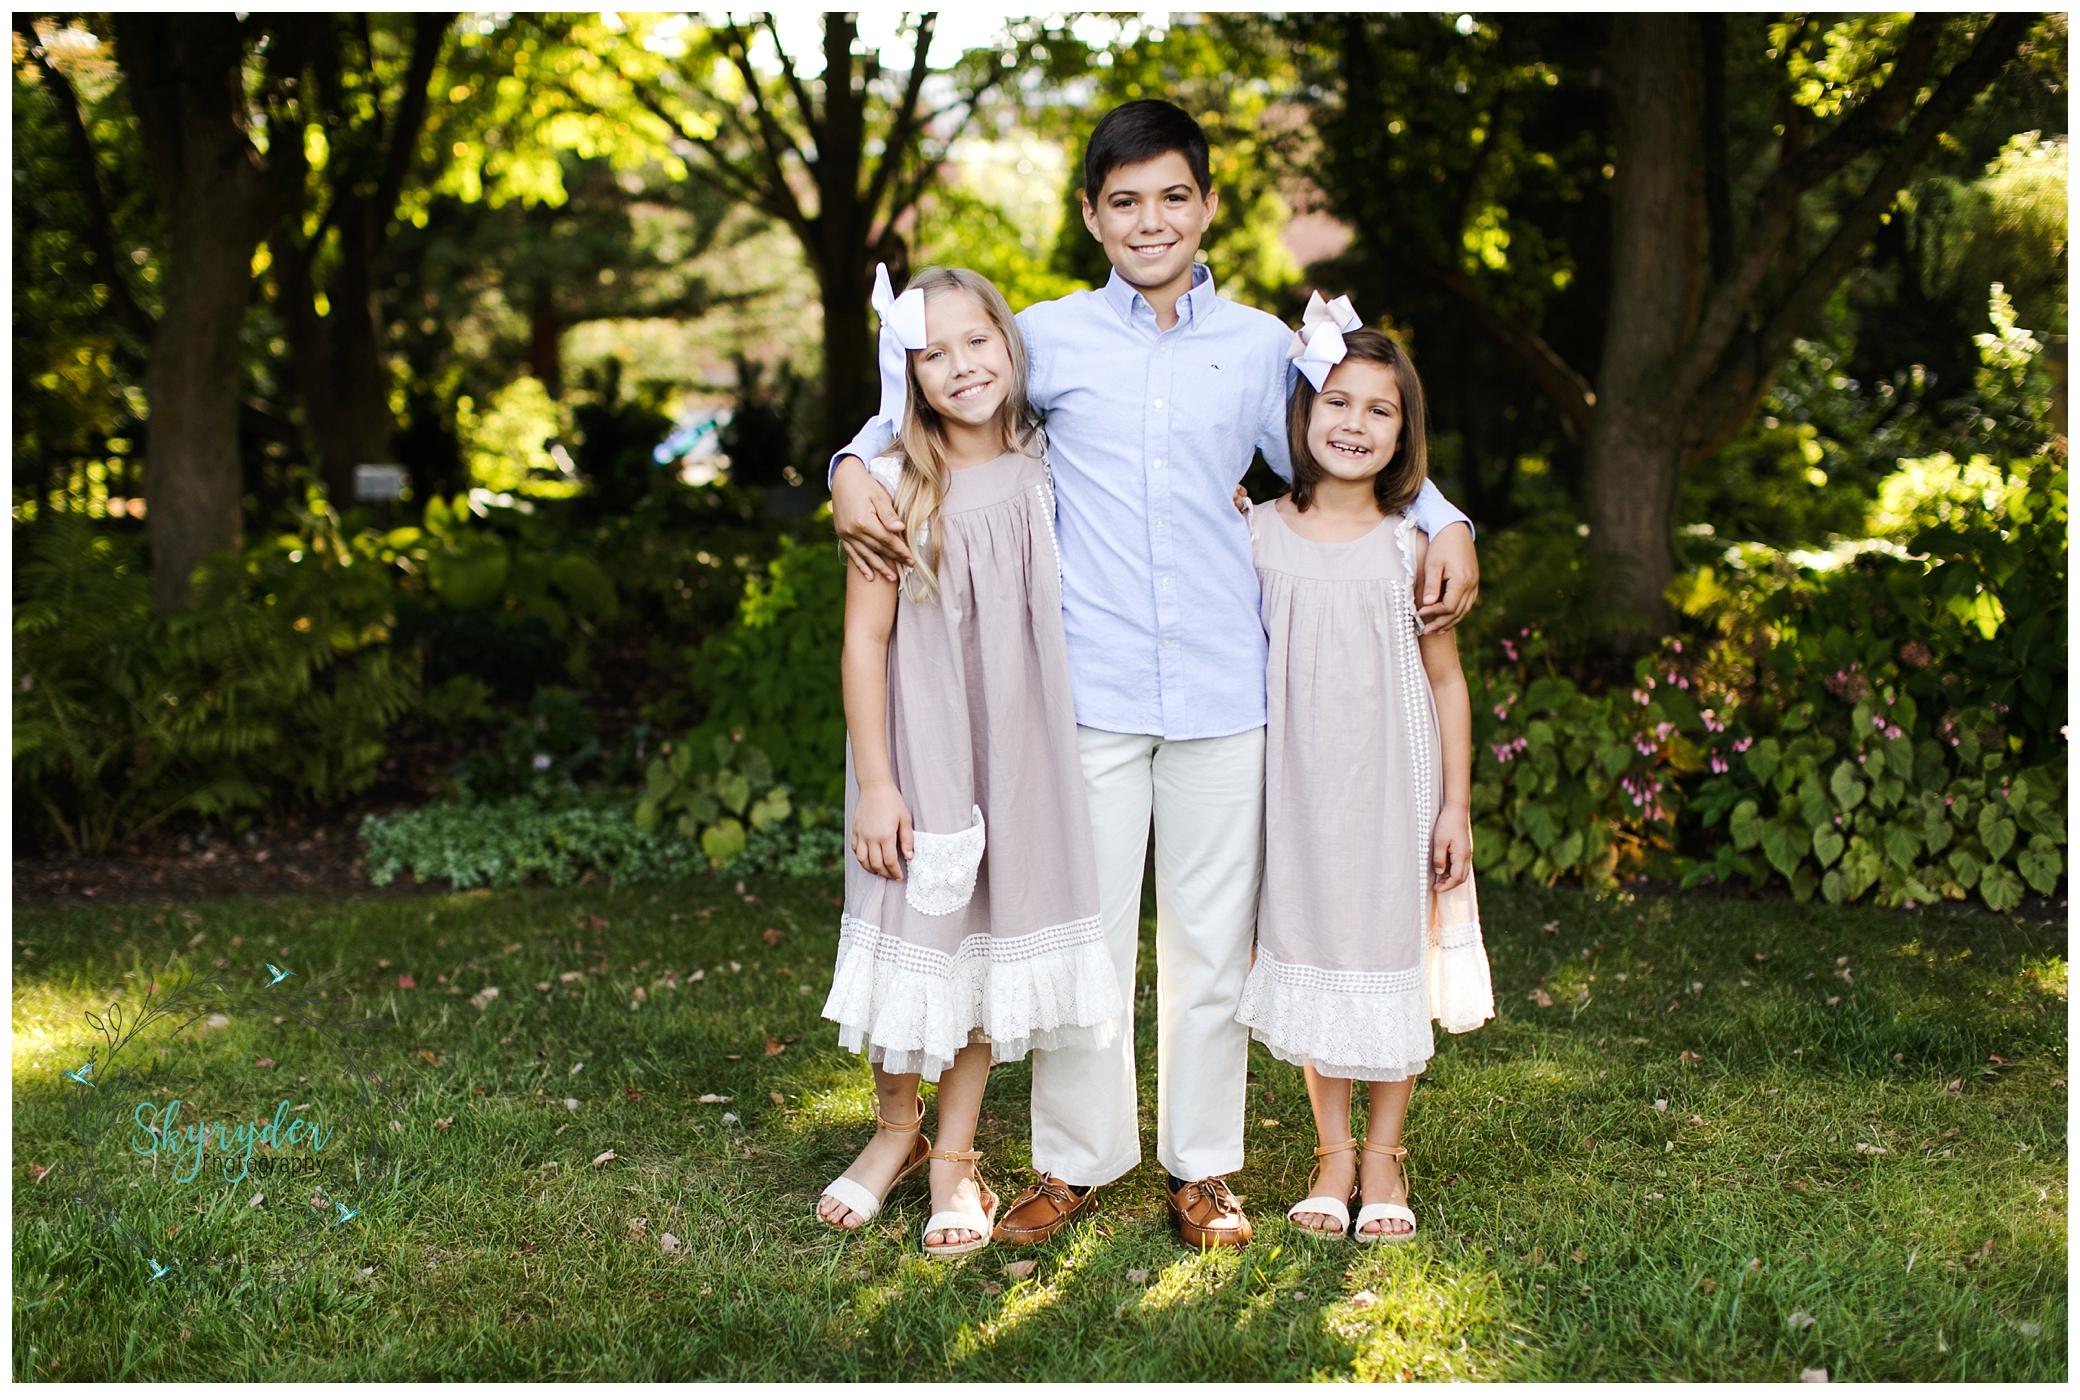 Ewing Grandkids   Blacksburg Family Photography